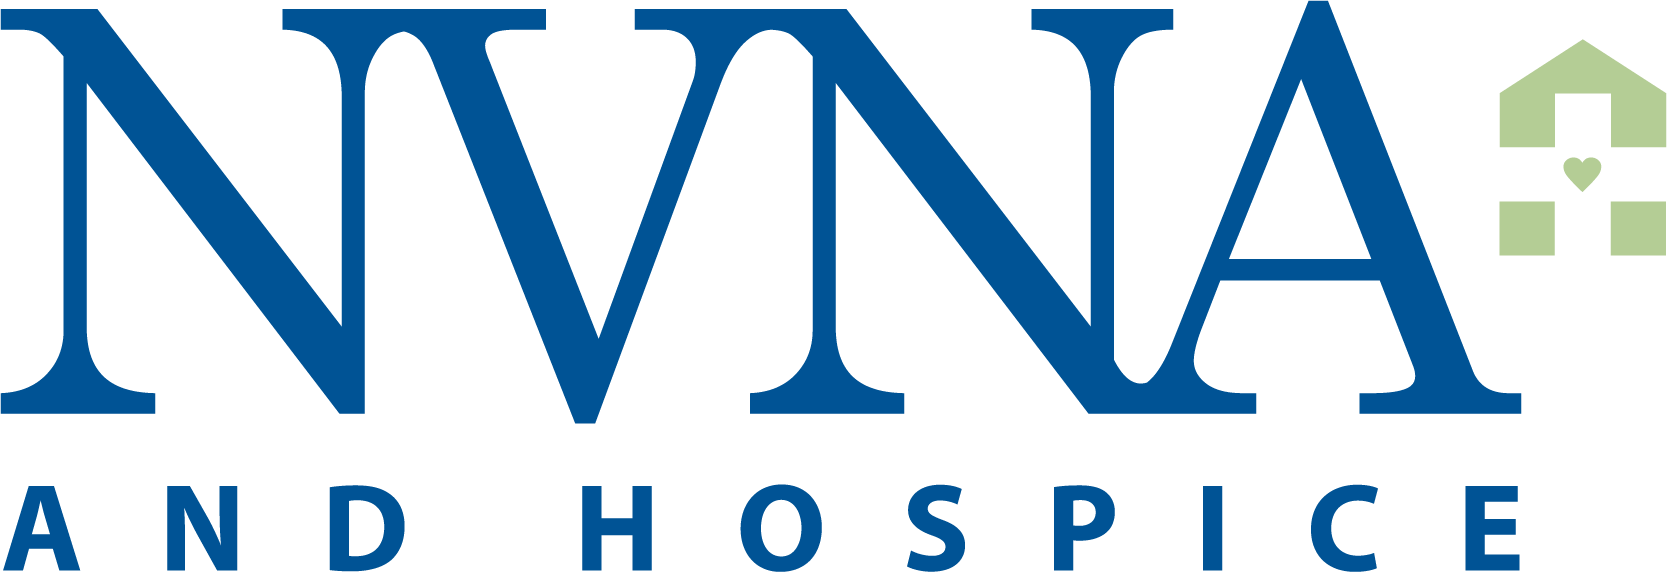 NVNA logo